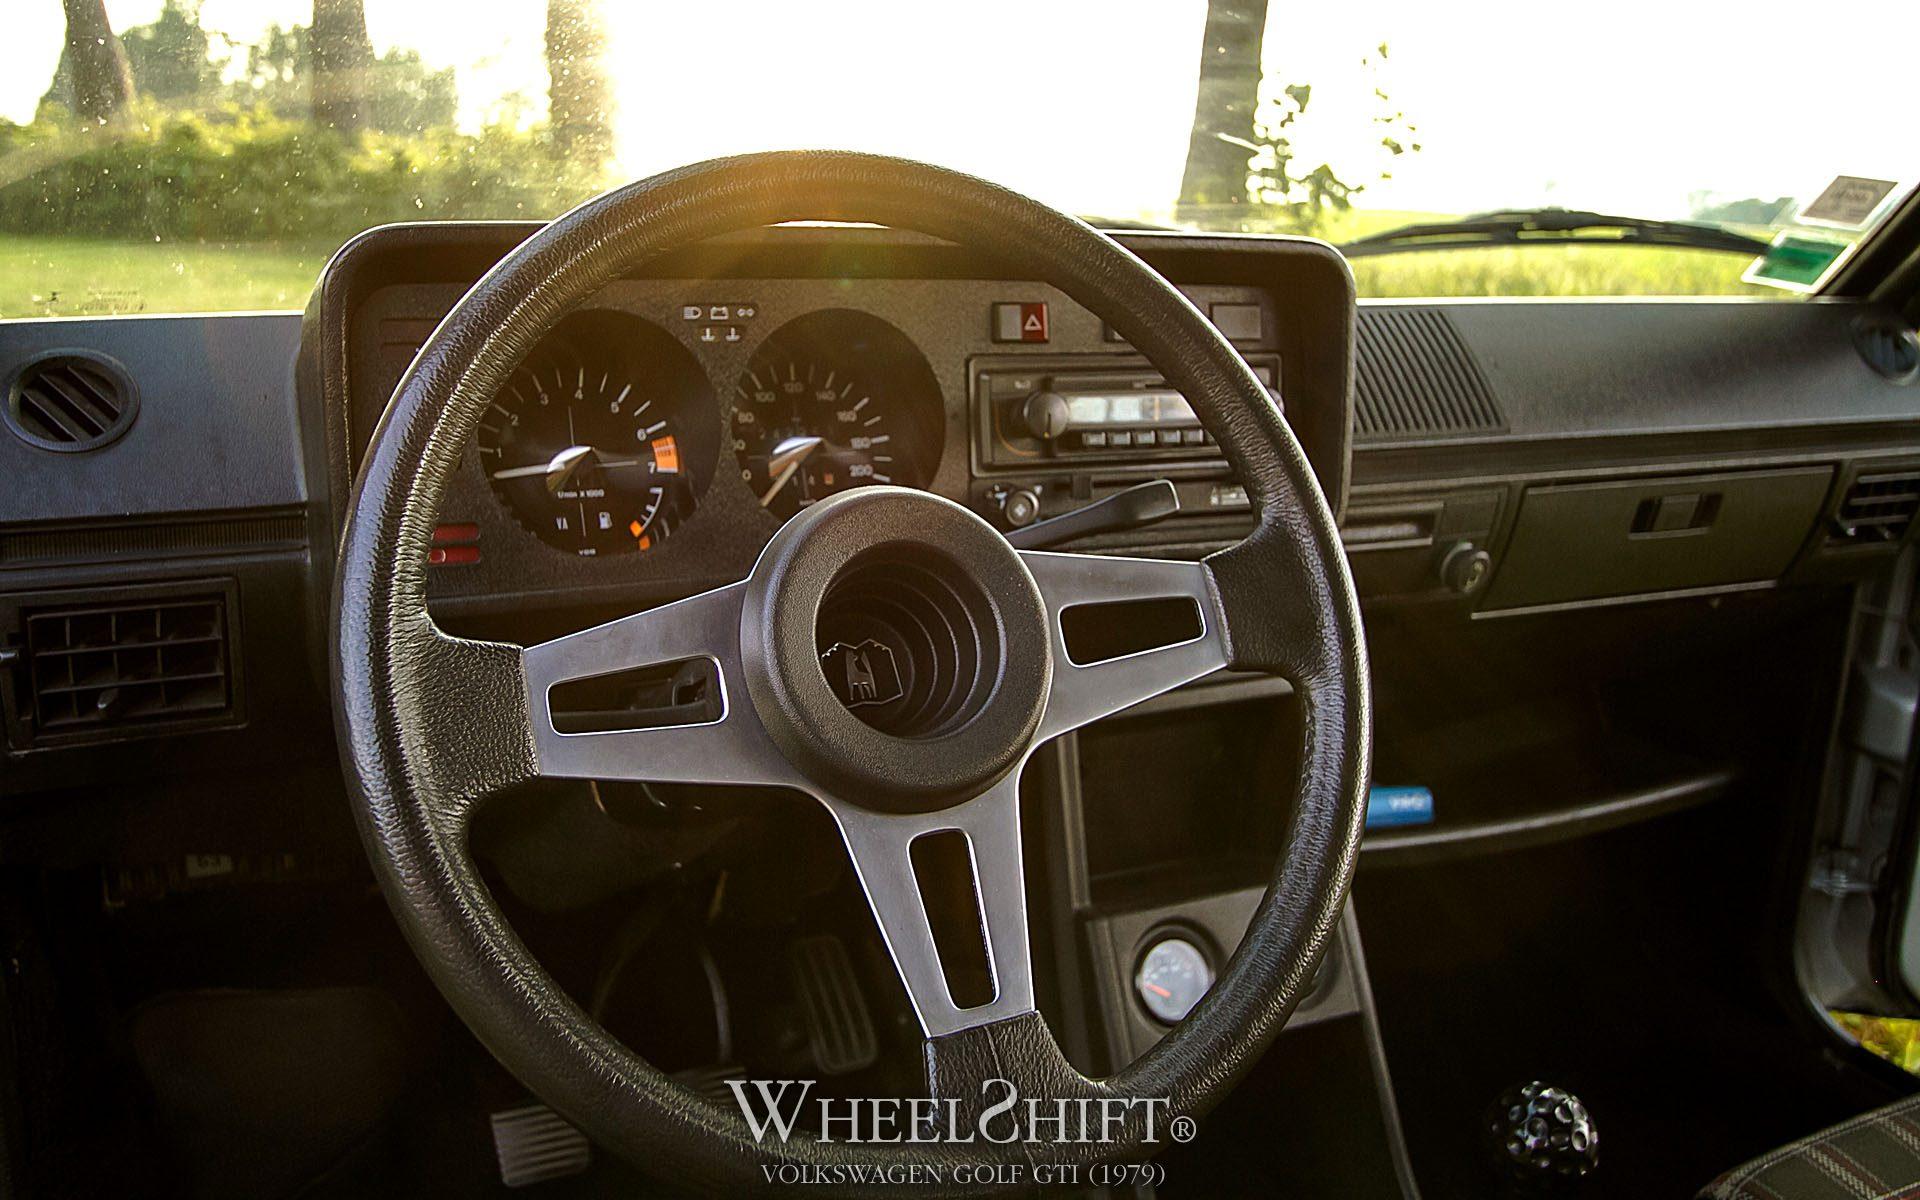 Volkswagen Golf GTI (1979)